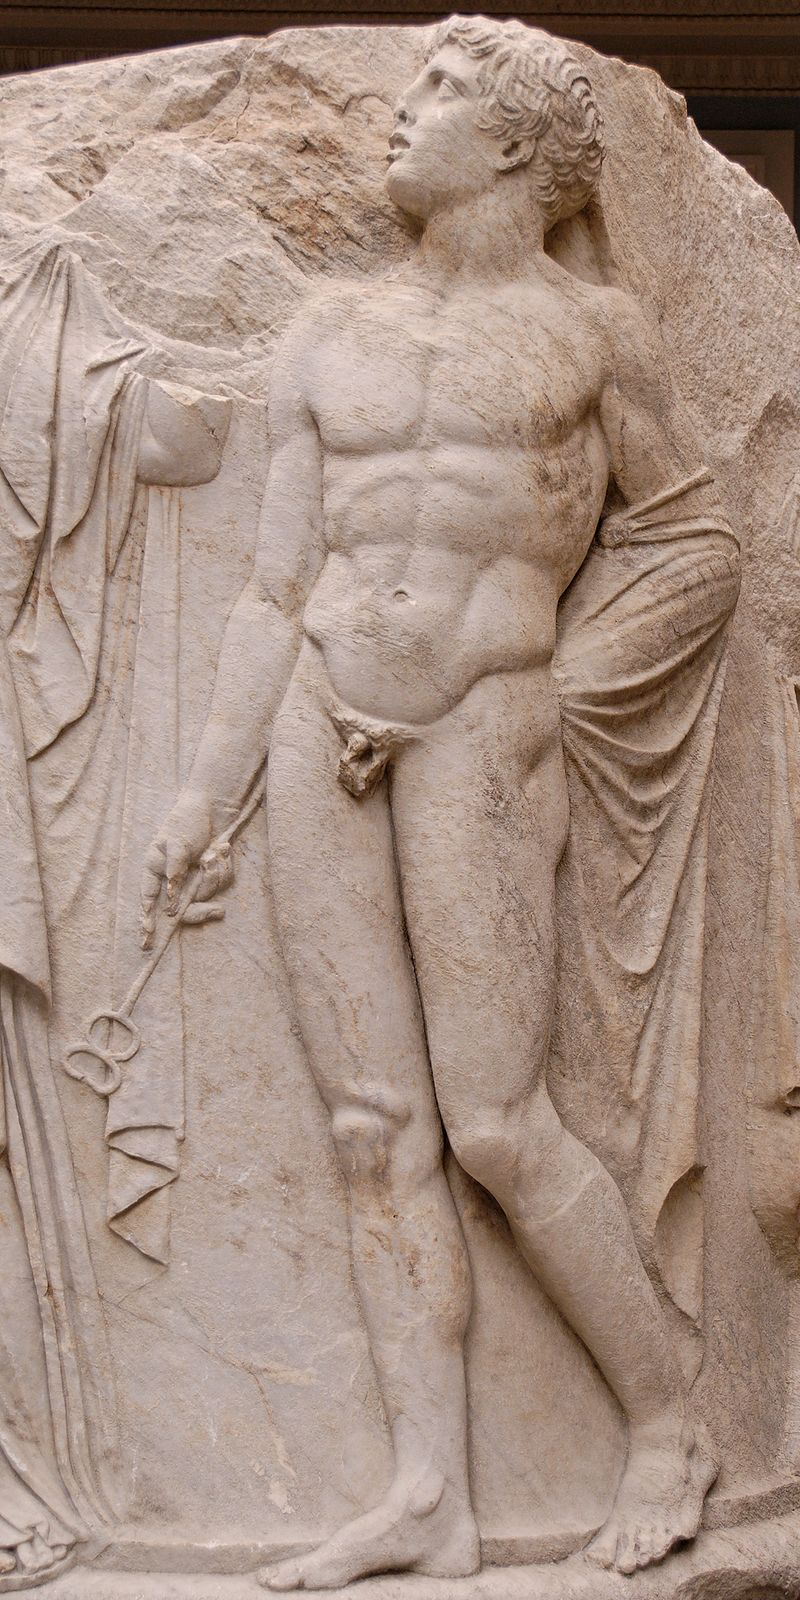 https://upload.wikimedia.org/wikipedia/commons/thumb/5/5a/Column_temple_Artemis_Ephesos_BM_Sc1206_n1.jpg/800px-Column_temple_Artemis_Ephesos_BM_Sc1206_n1.jpg